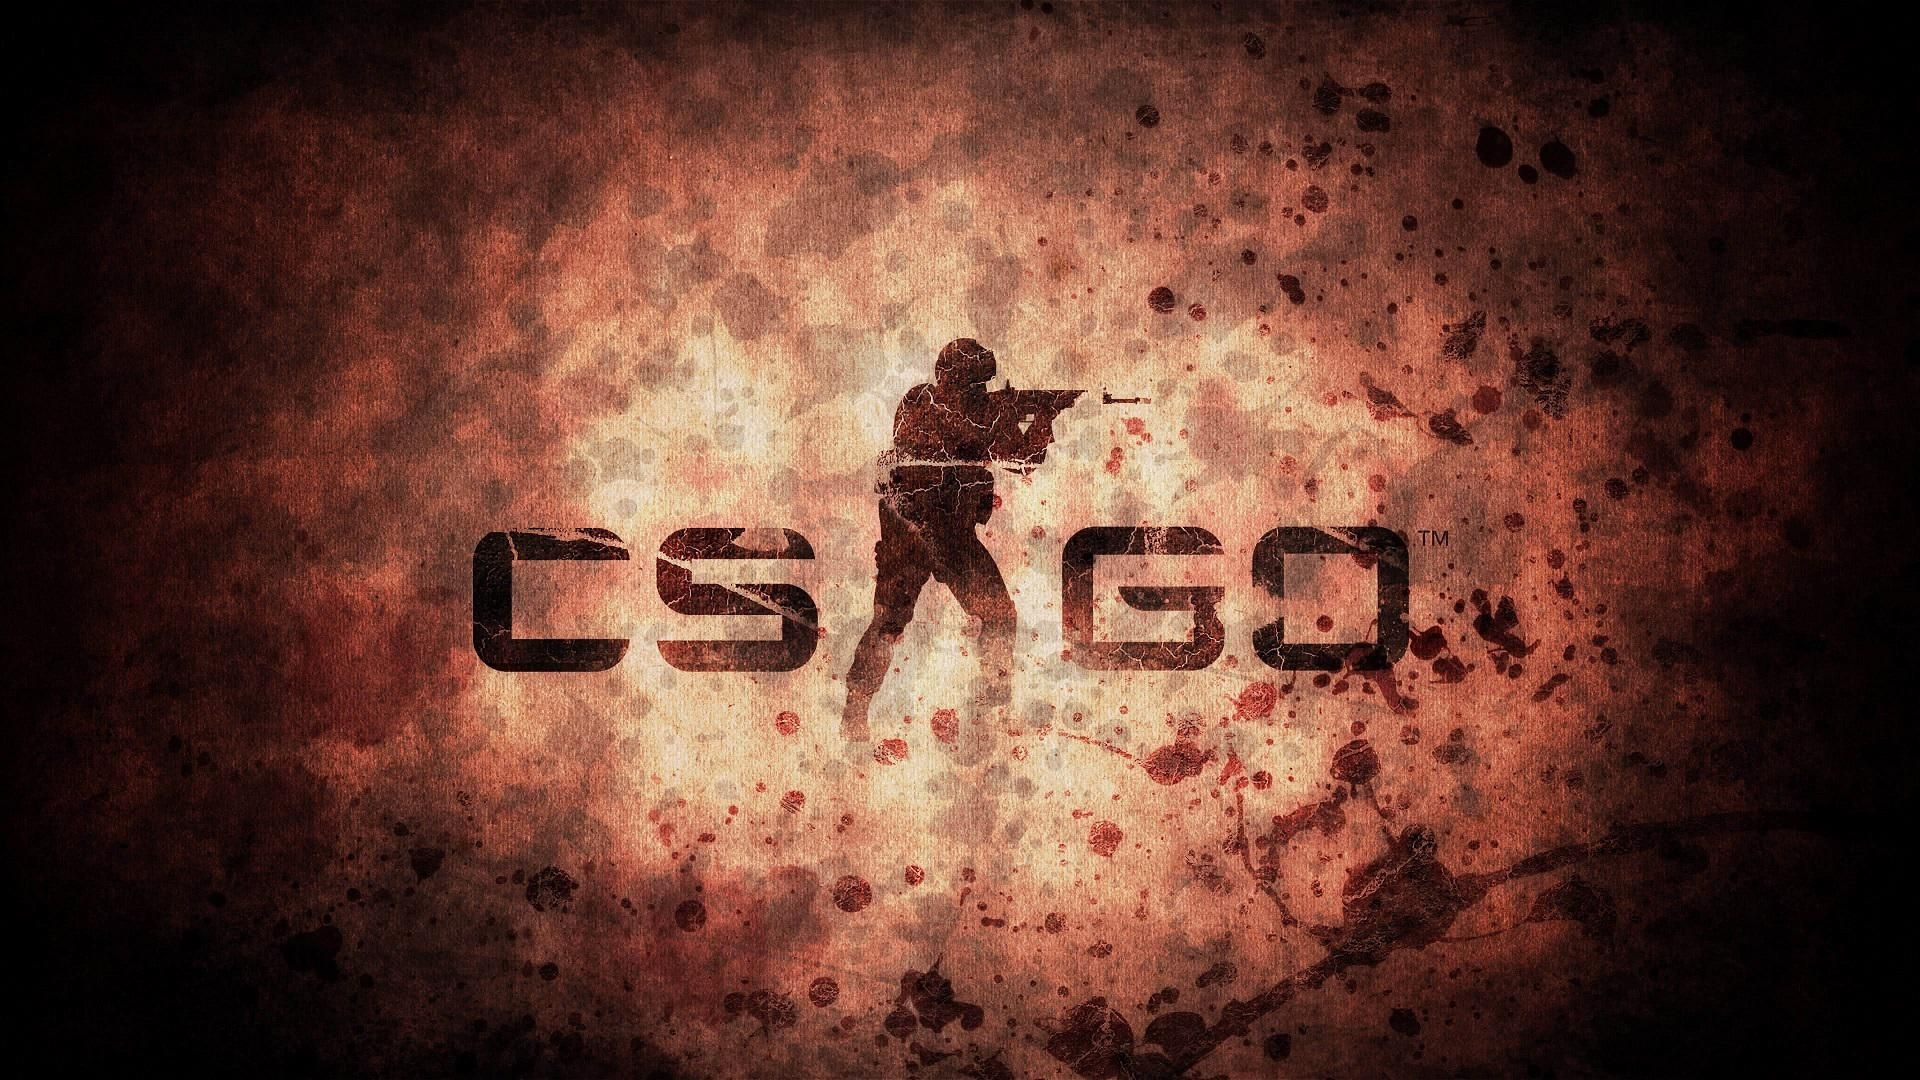 Csgo best background